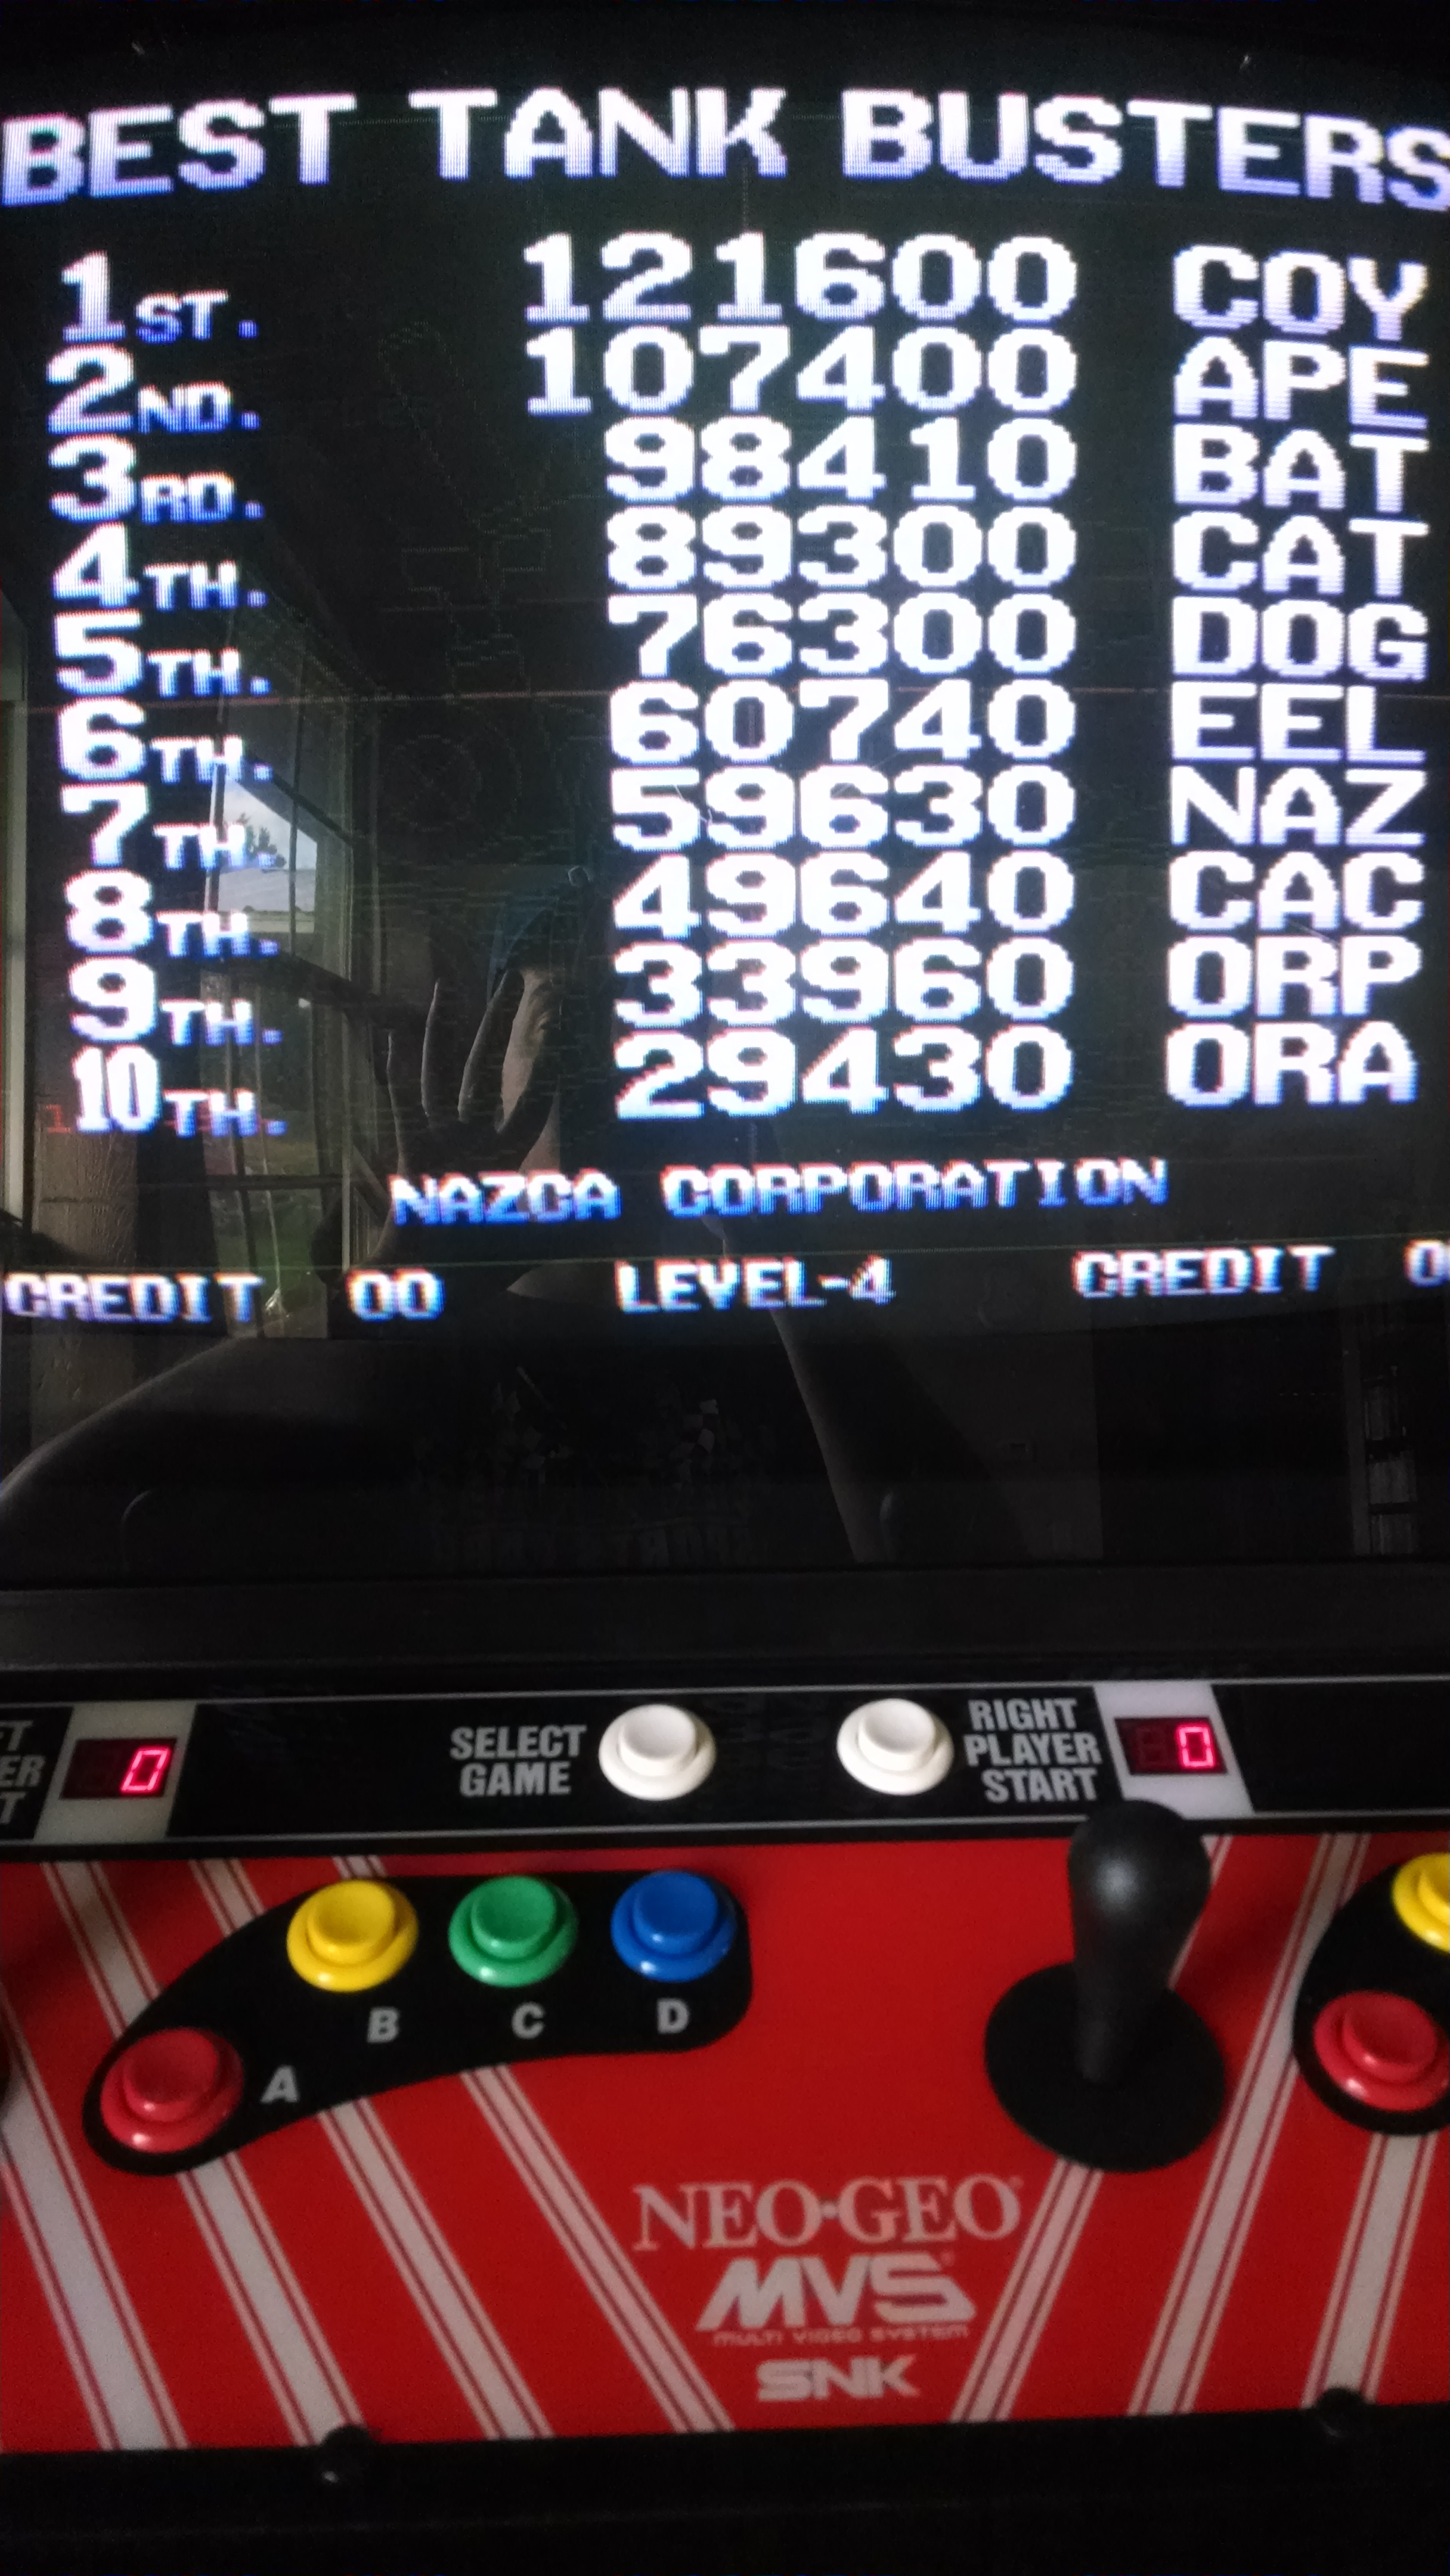 Metal Slug 121,600 points